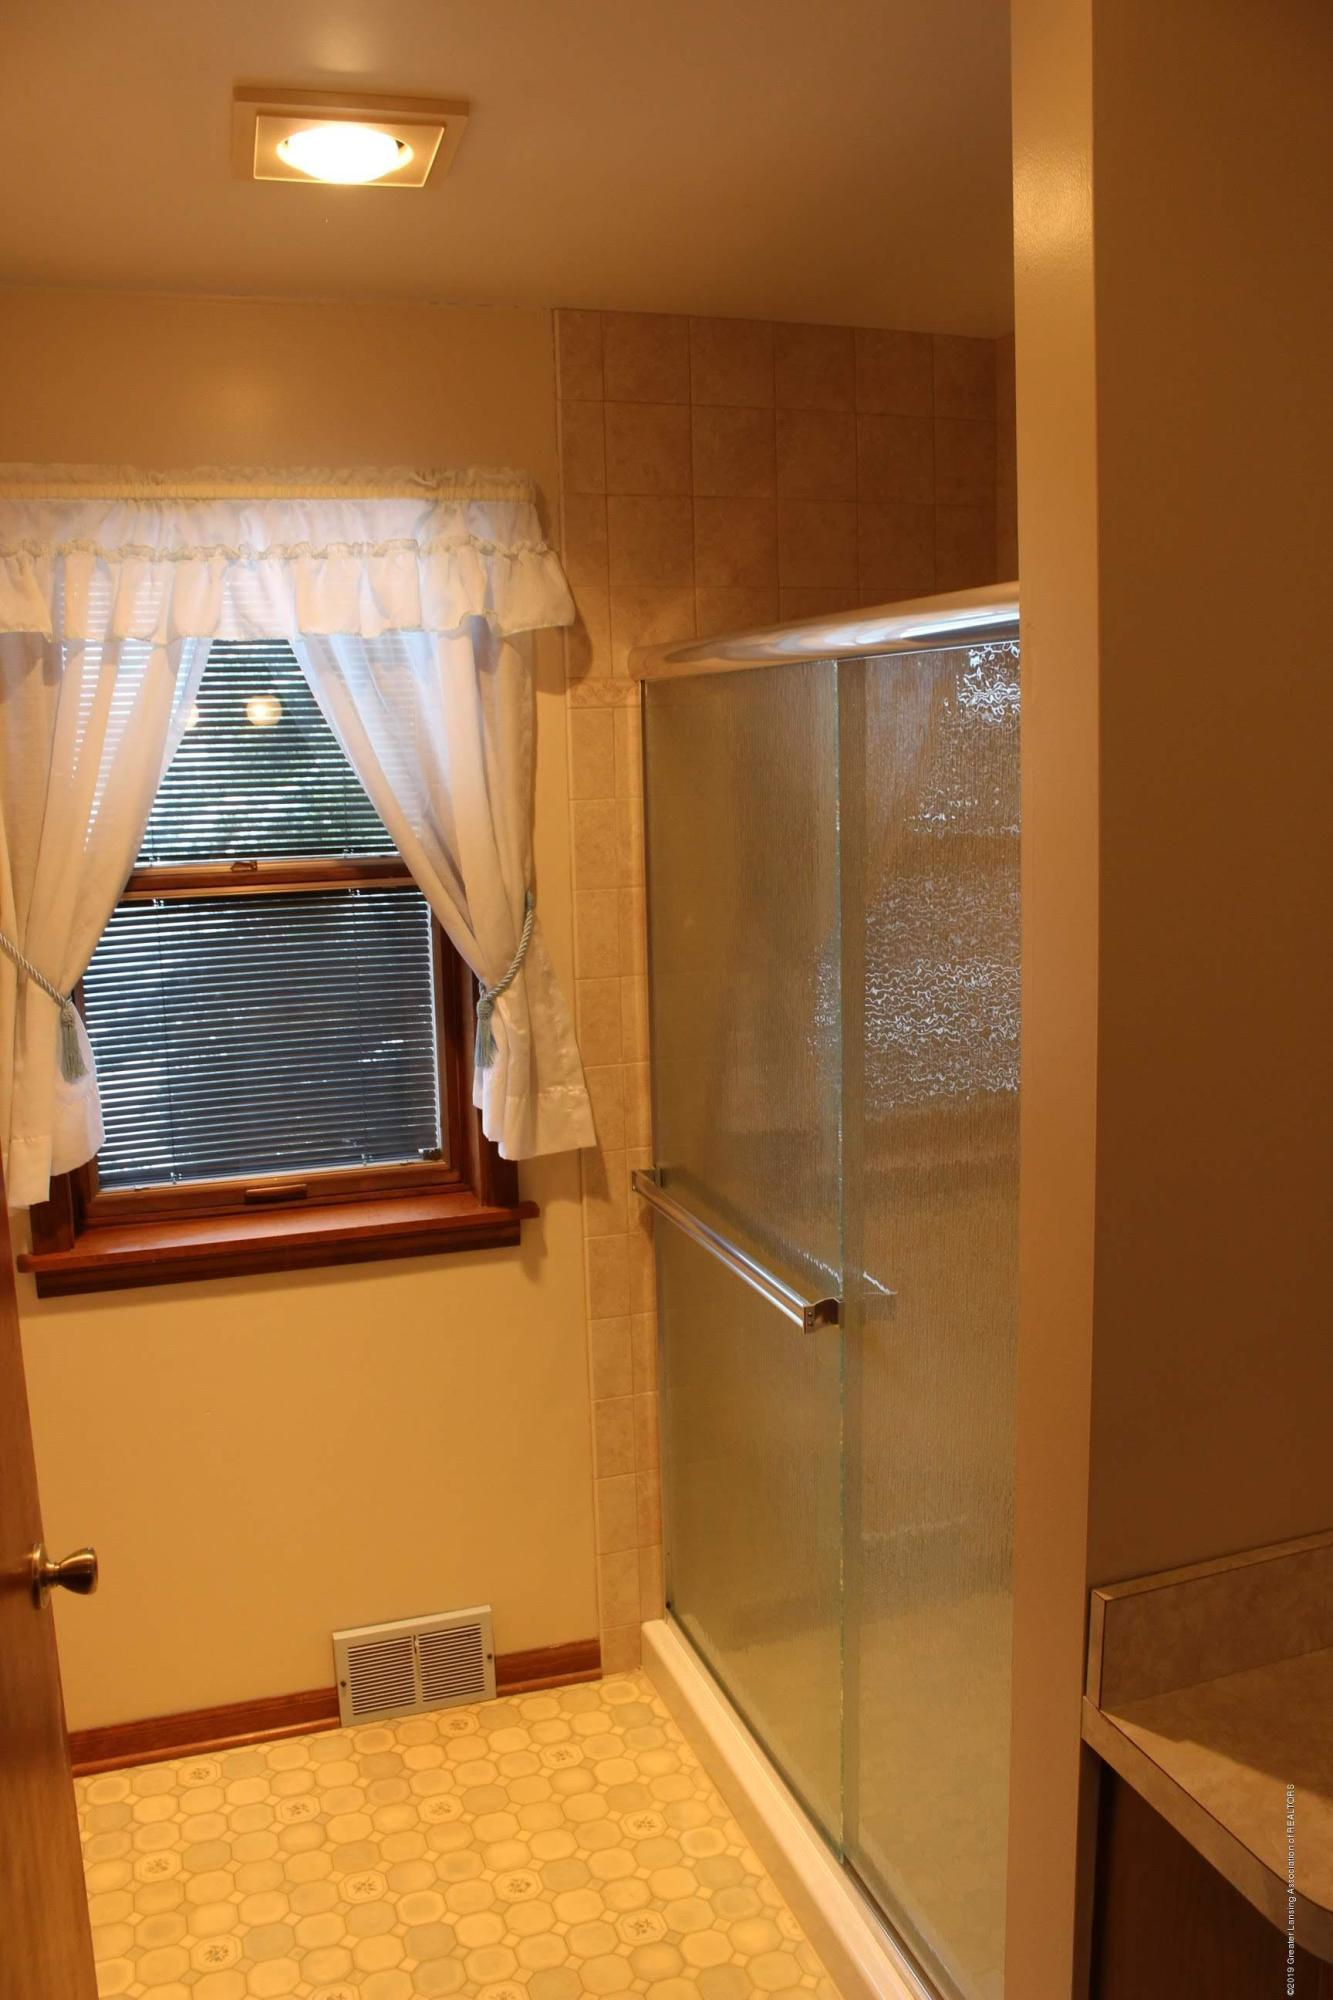 436 N Maple St - Master Suite Bathroom - 12